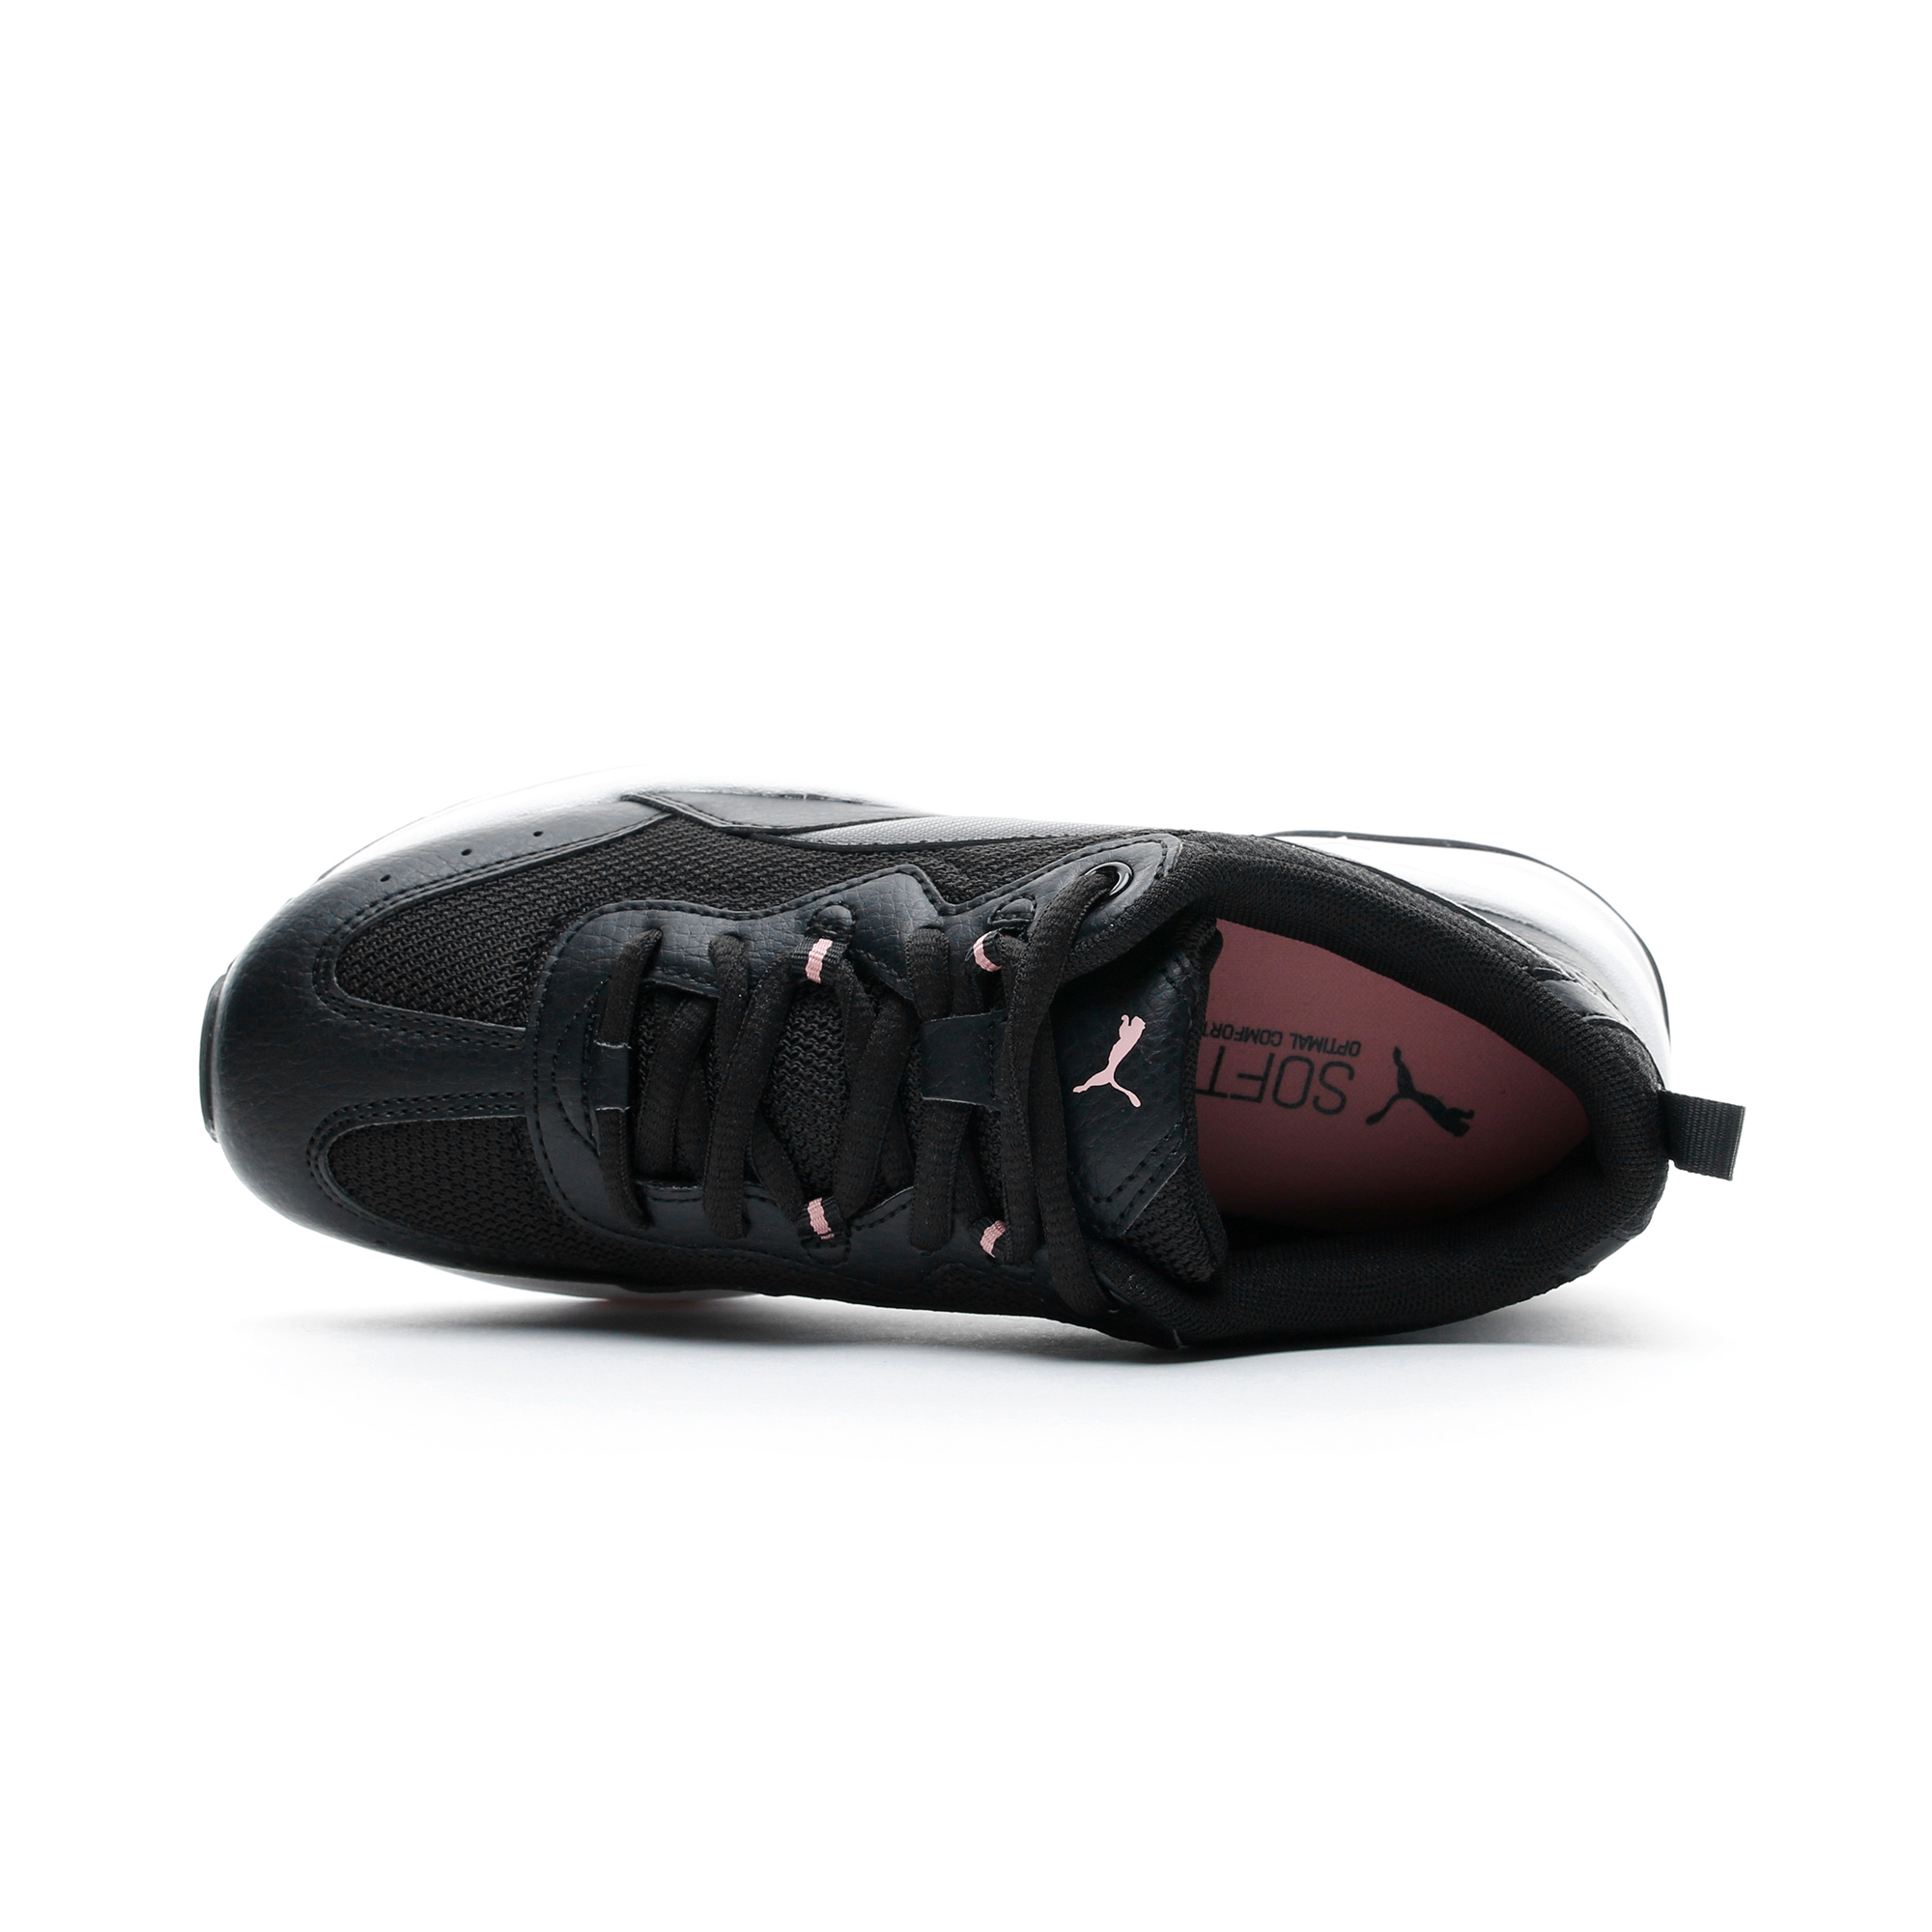 Puma Cilia Kadın Siyah Spor Ayakkabı